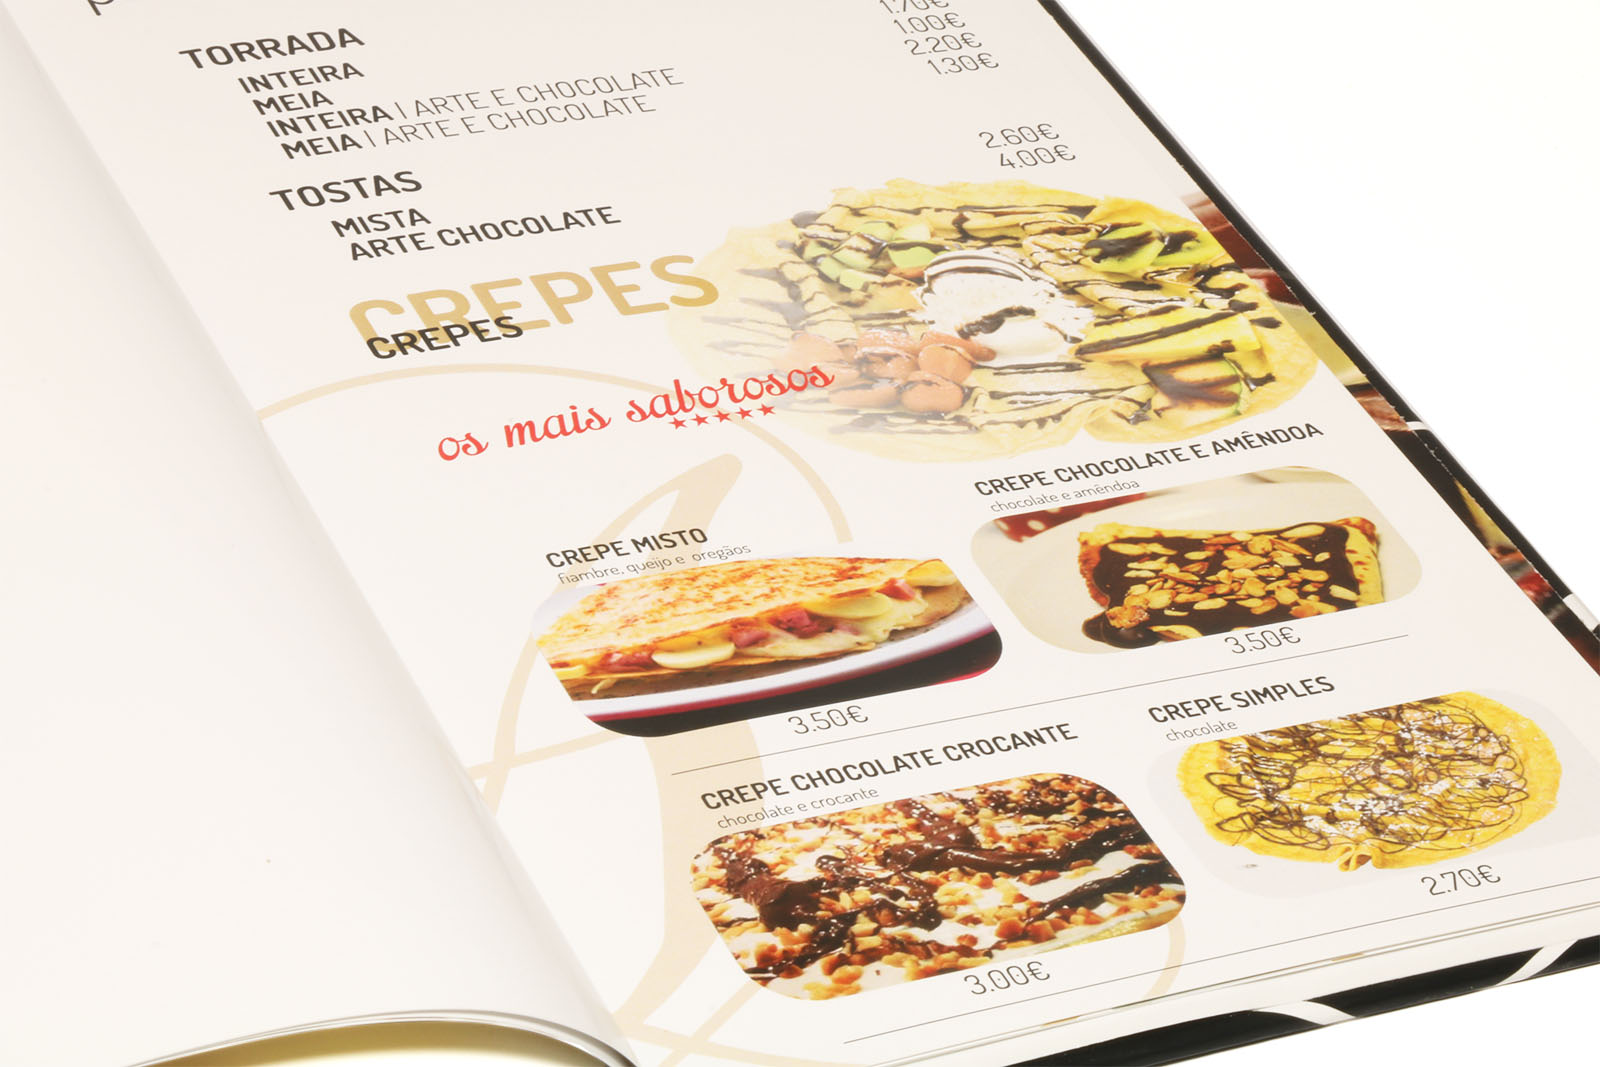 carta-menu aberta